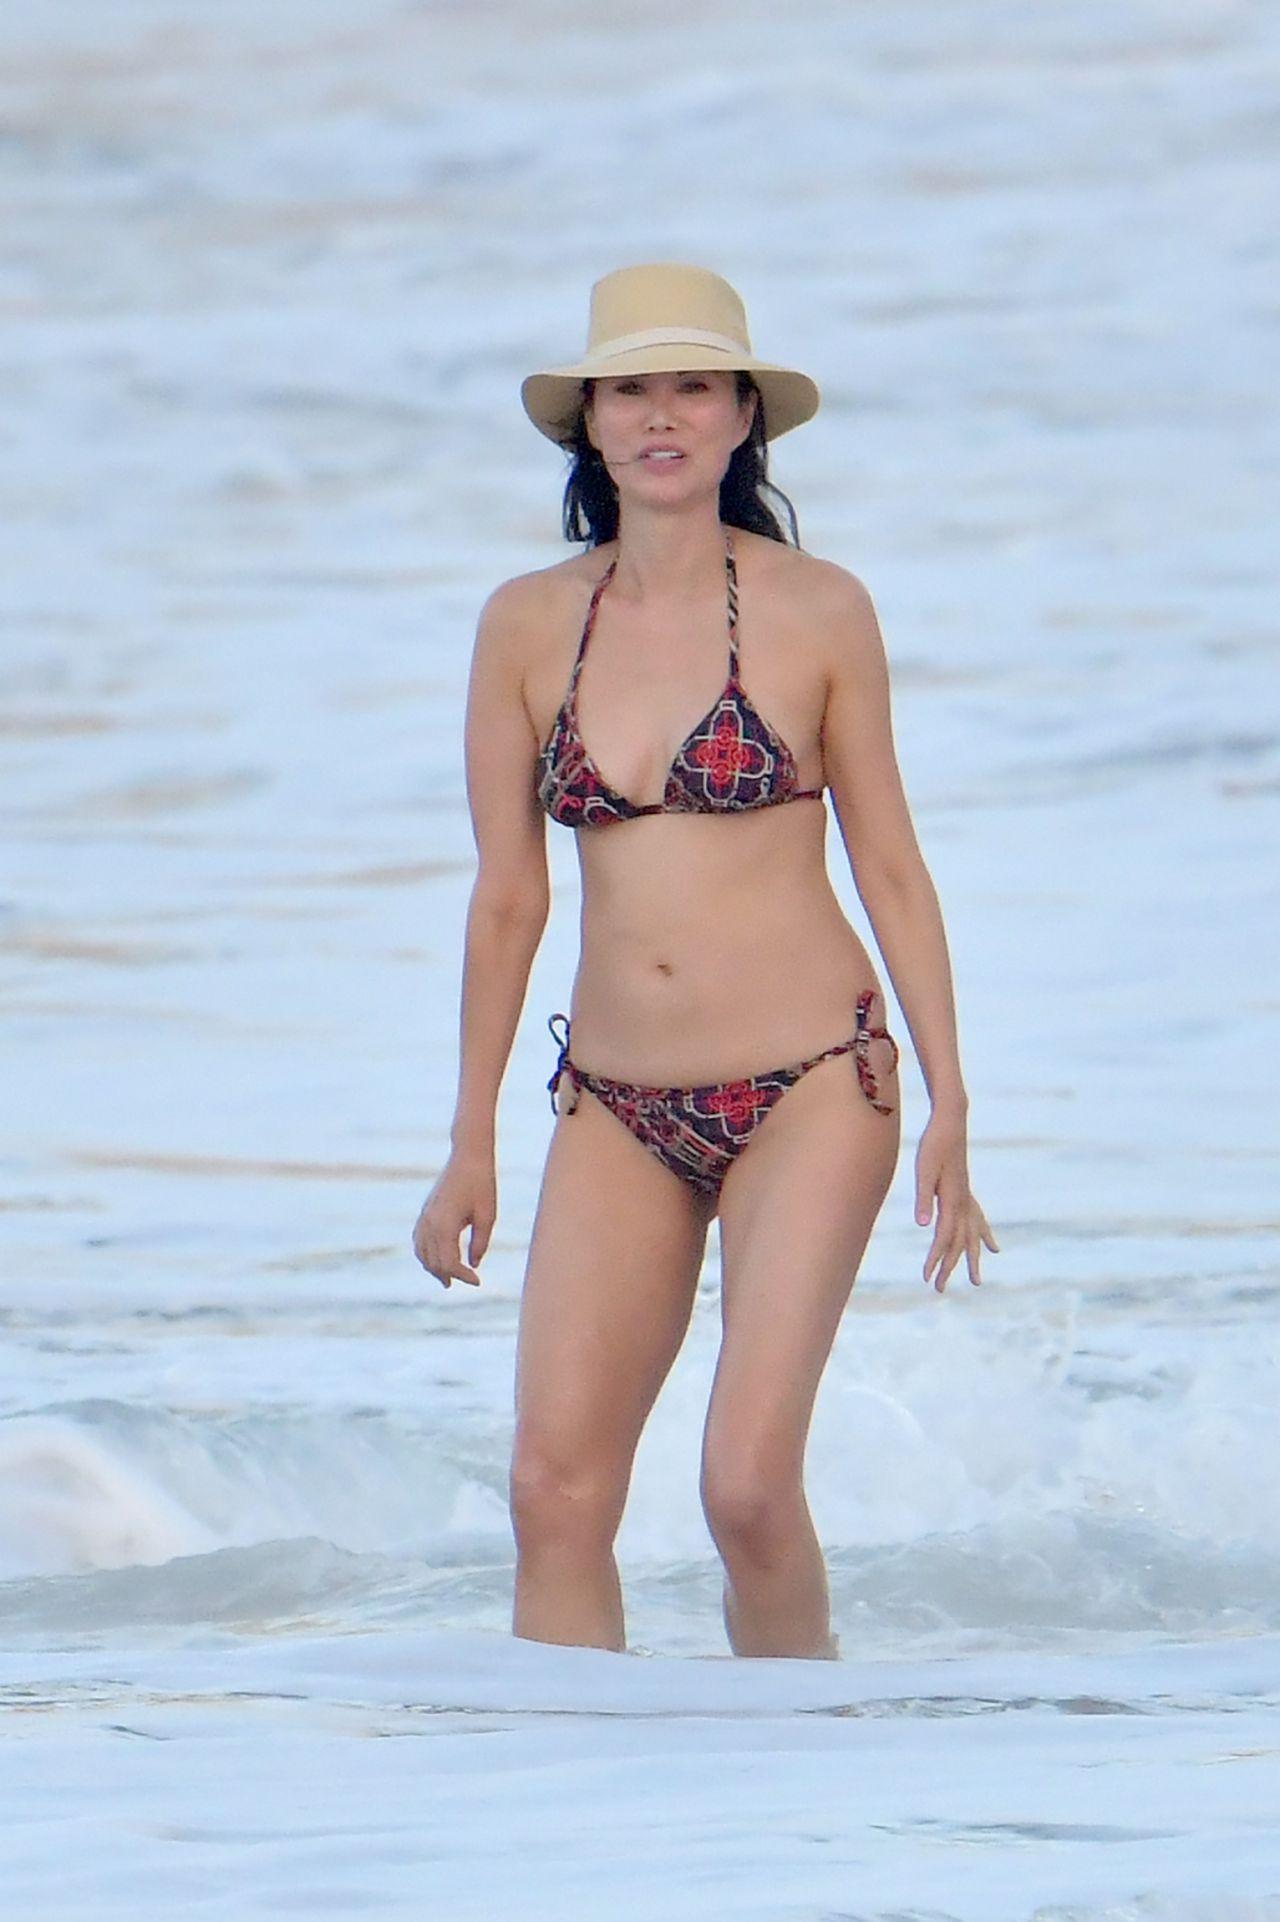 Wendi Deng Murdoch Bikini Nude Photos 59